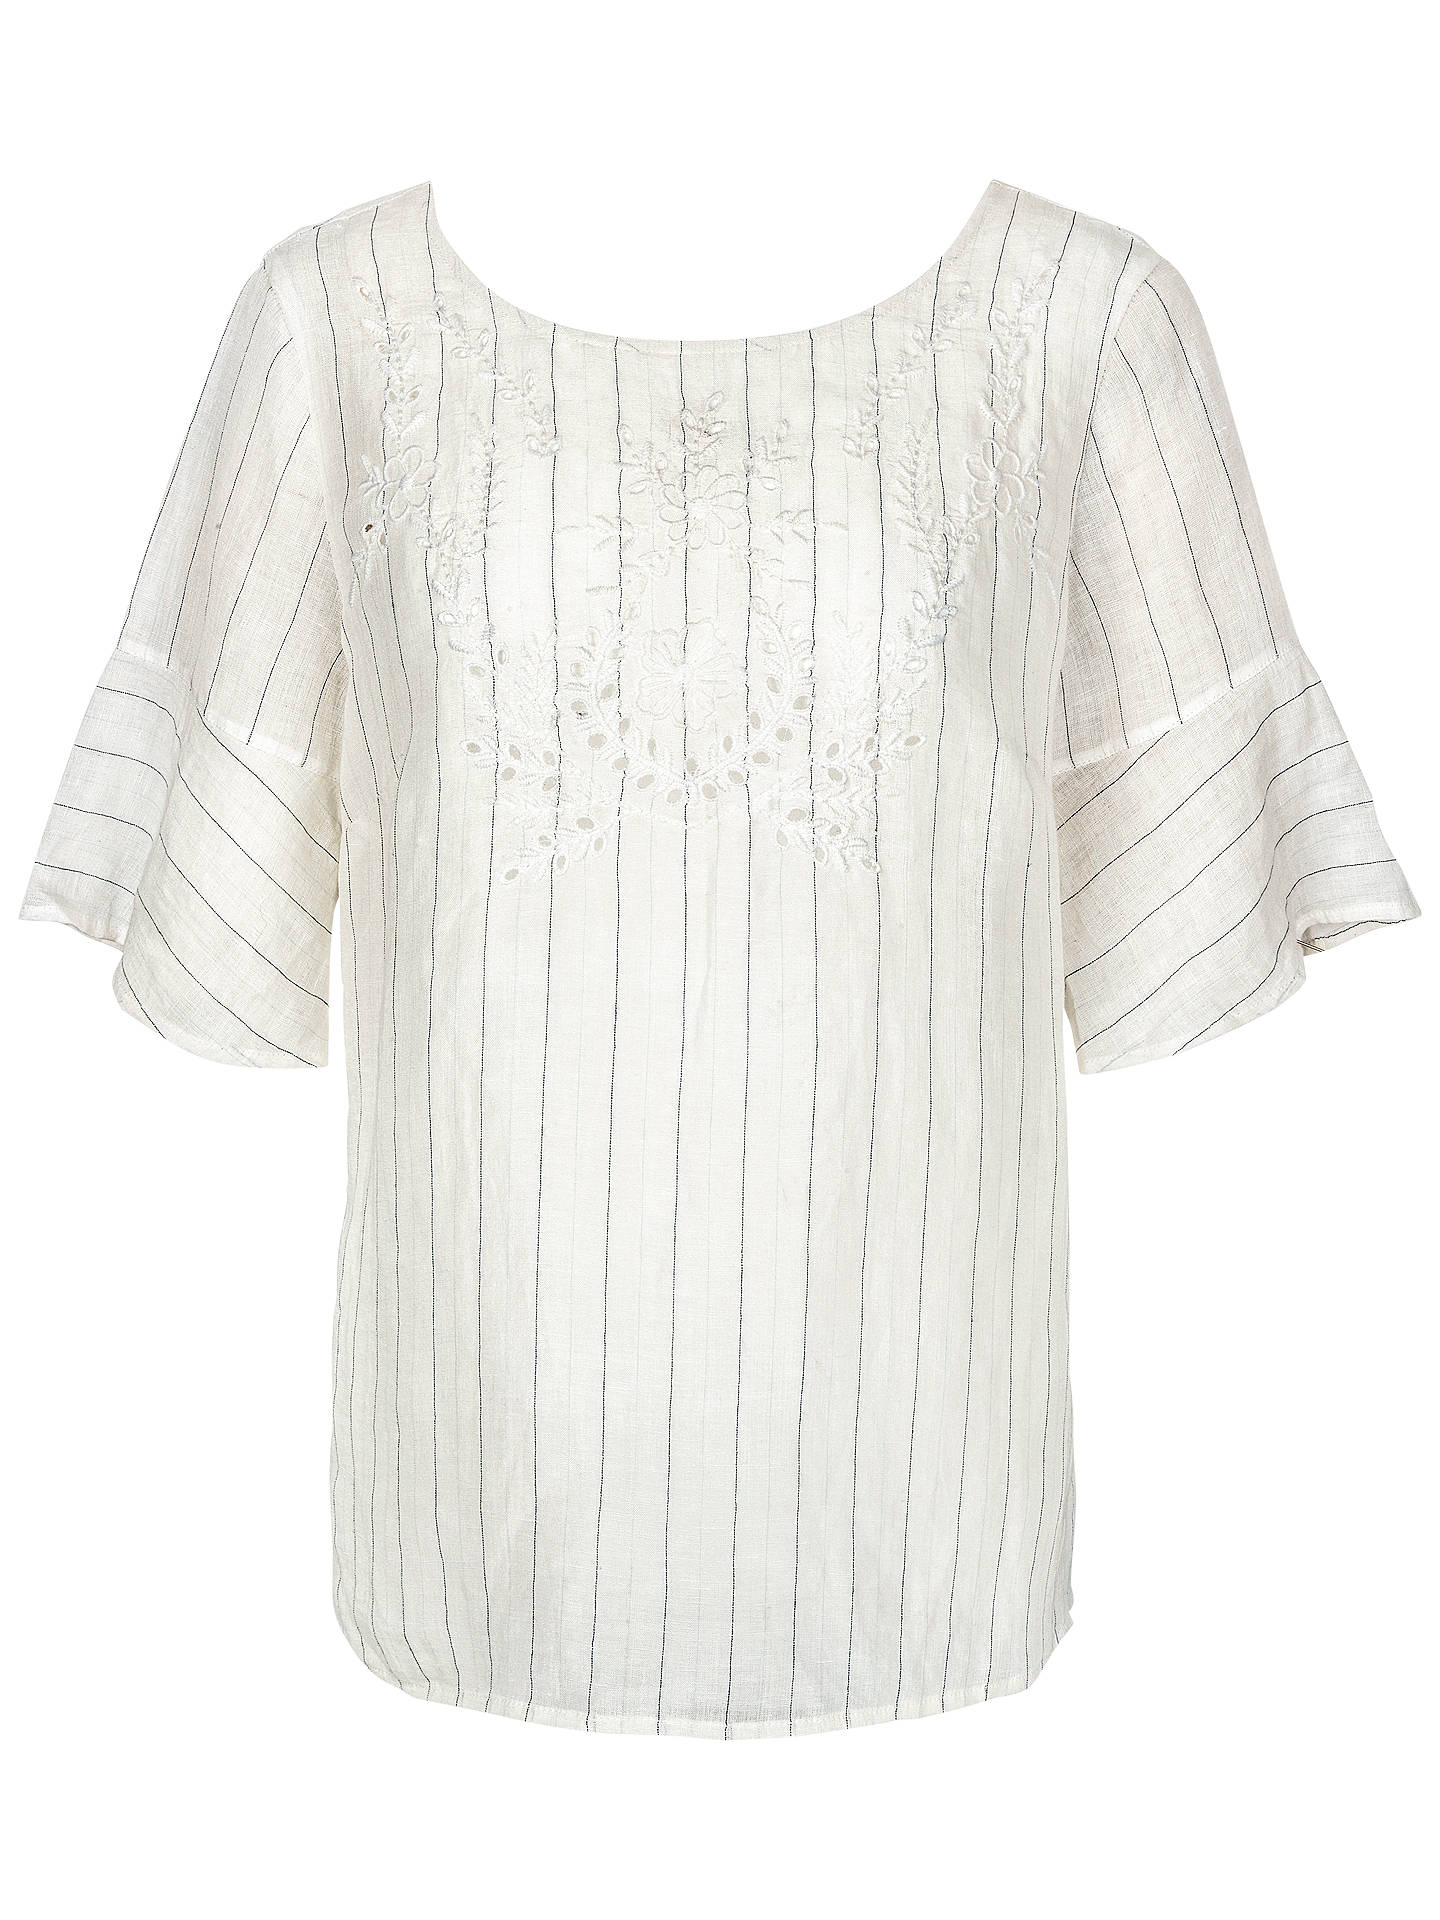 7cfac70503df22 Buy Fat Face Elizabeth Embroidered Linen Blend Top, Ivory, 6 Online at  johnlewis.